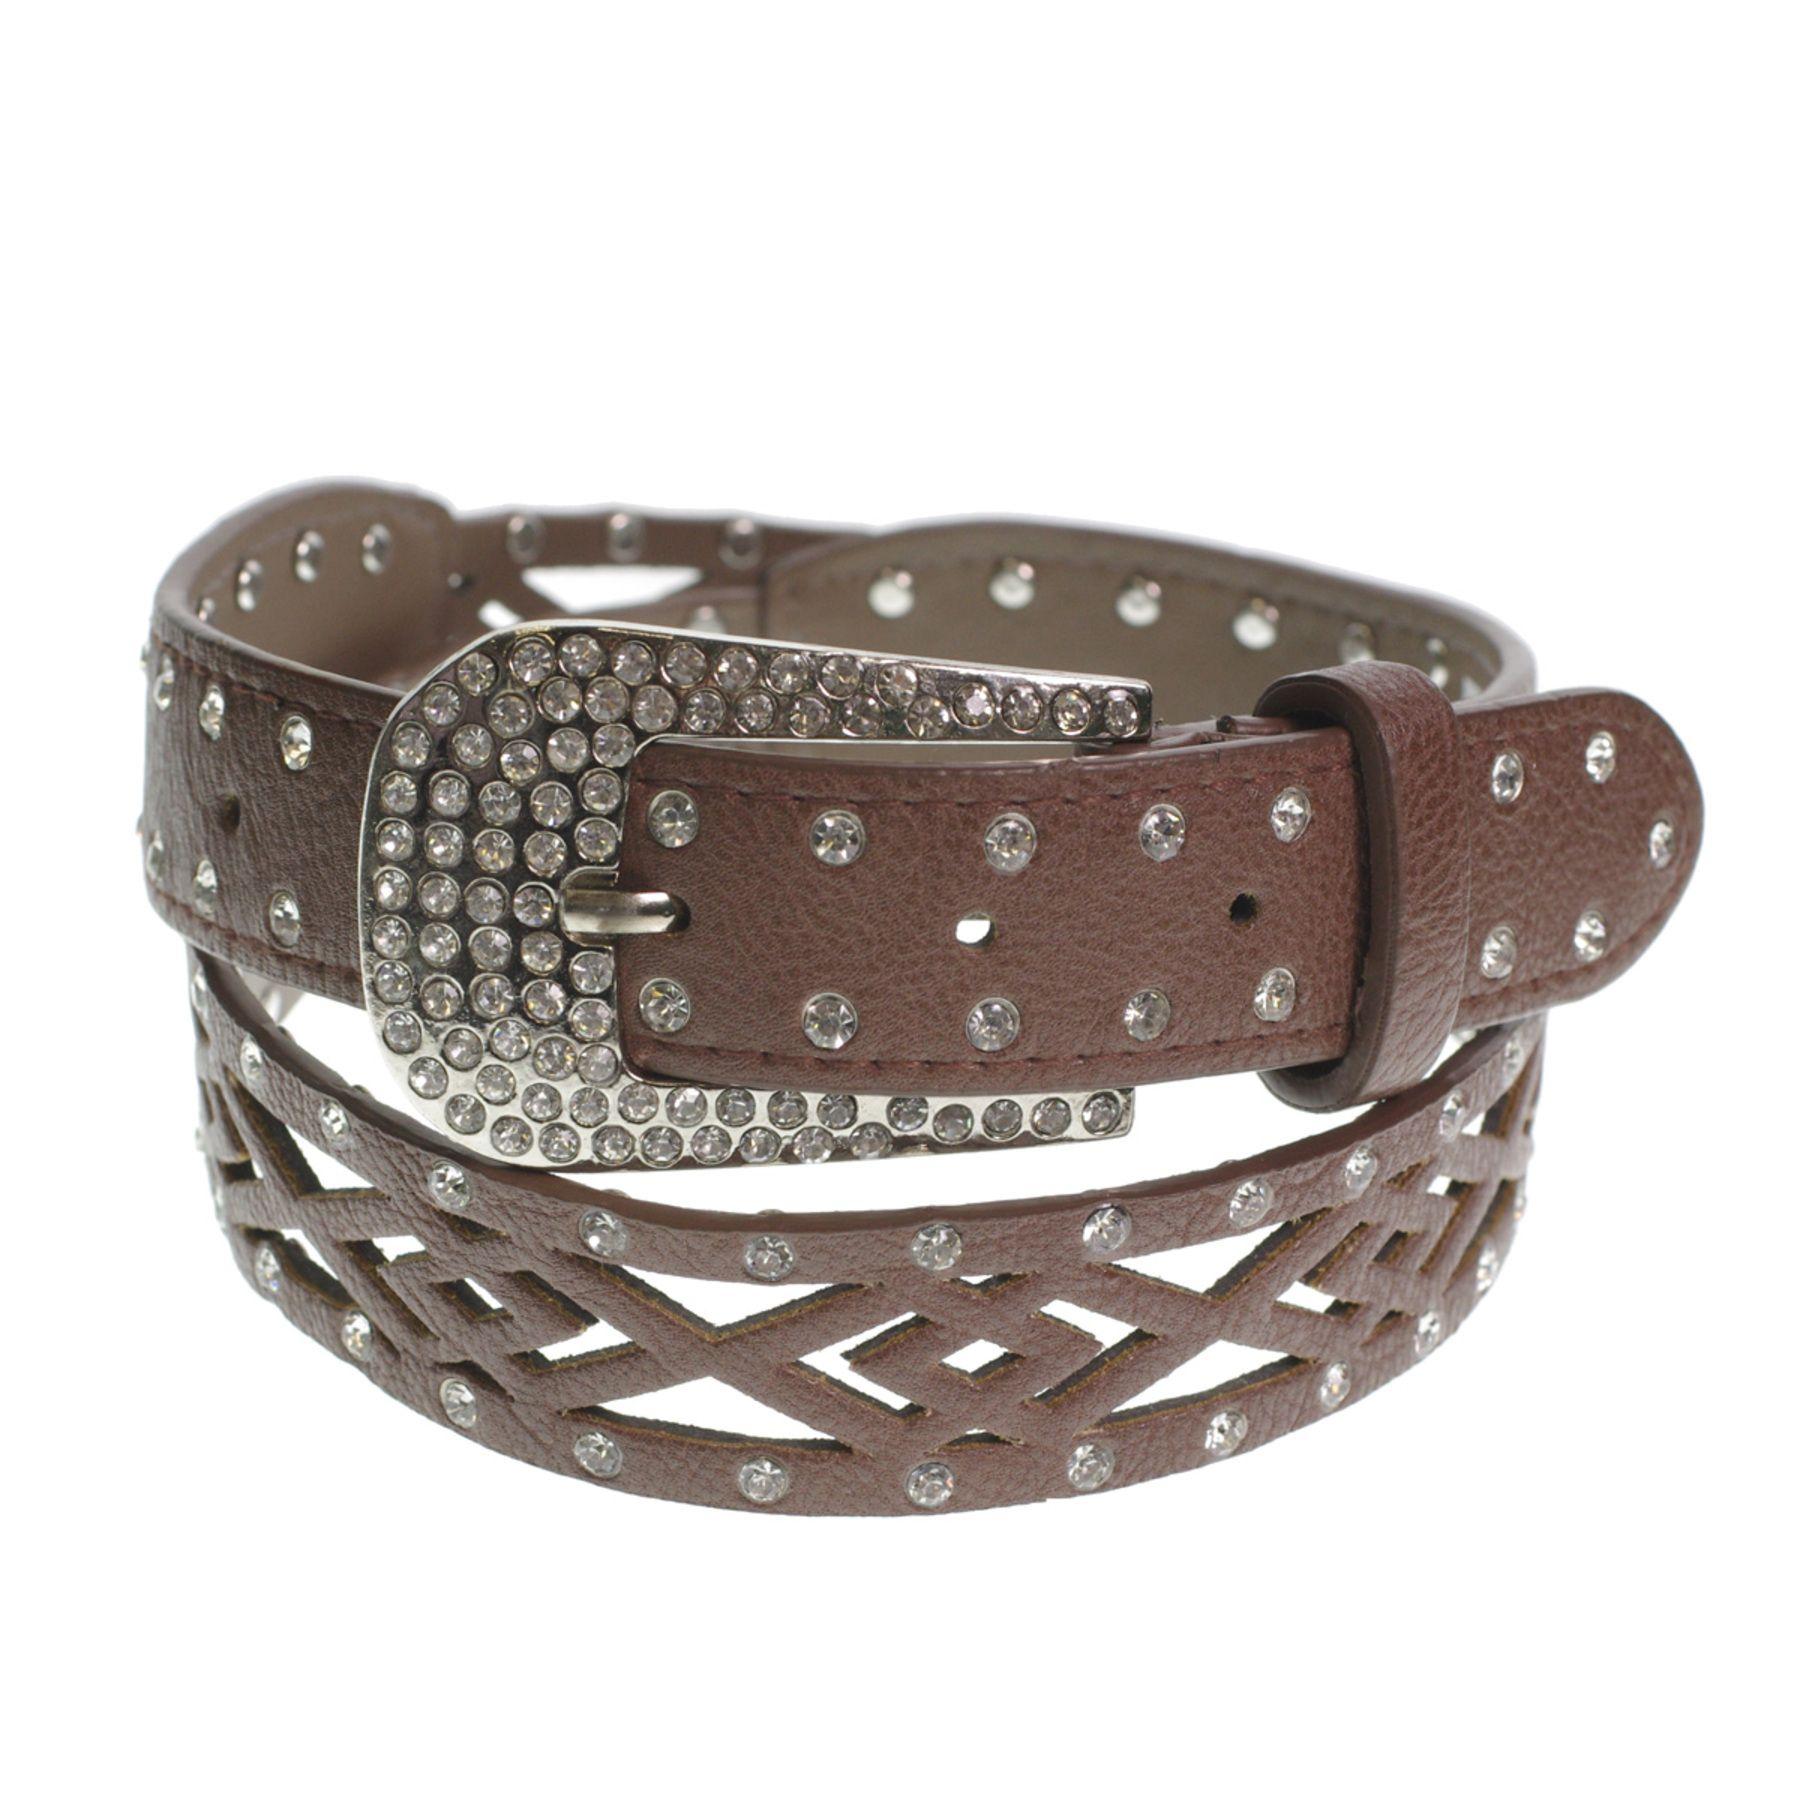 e00cae1a34c8 4 cm strass leatherette belt, QL19